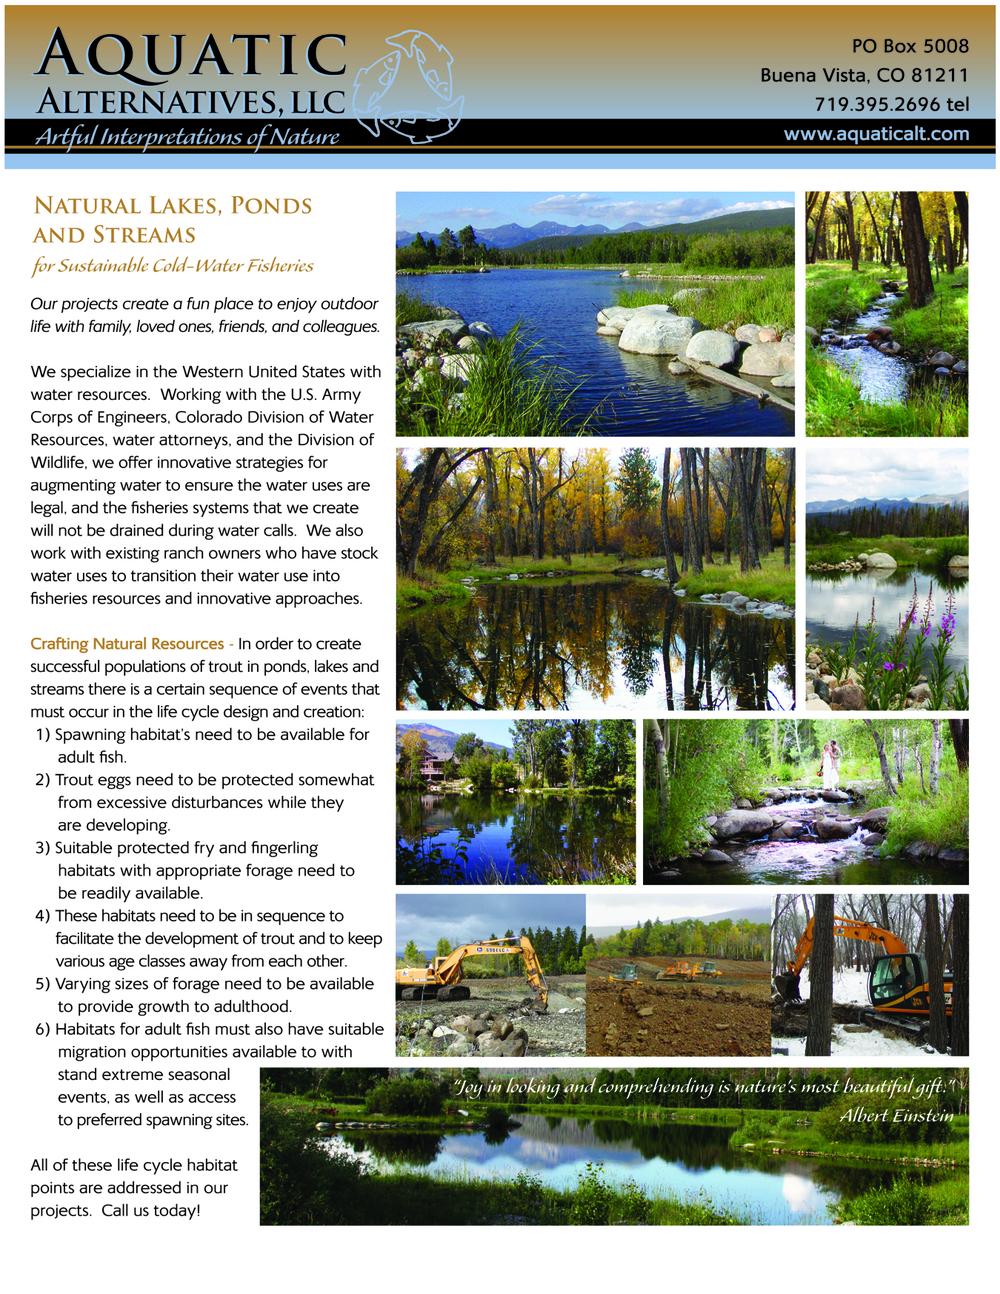 AA-Nat-Lake-Pond2.jpg